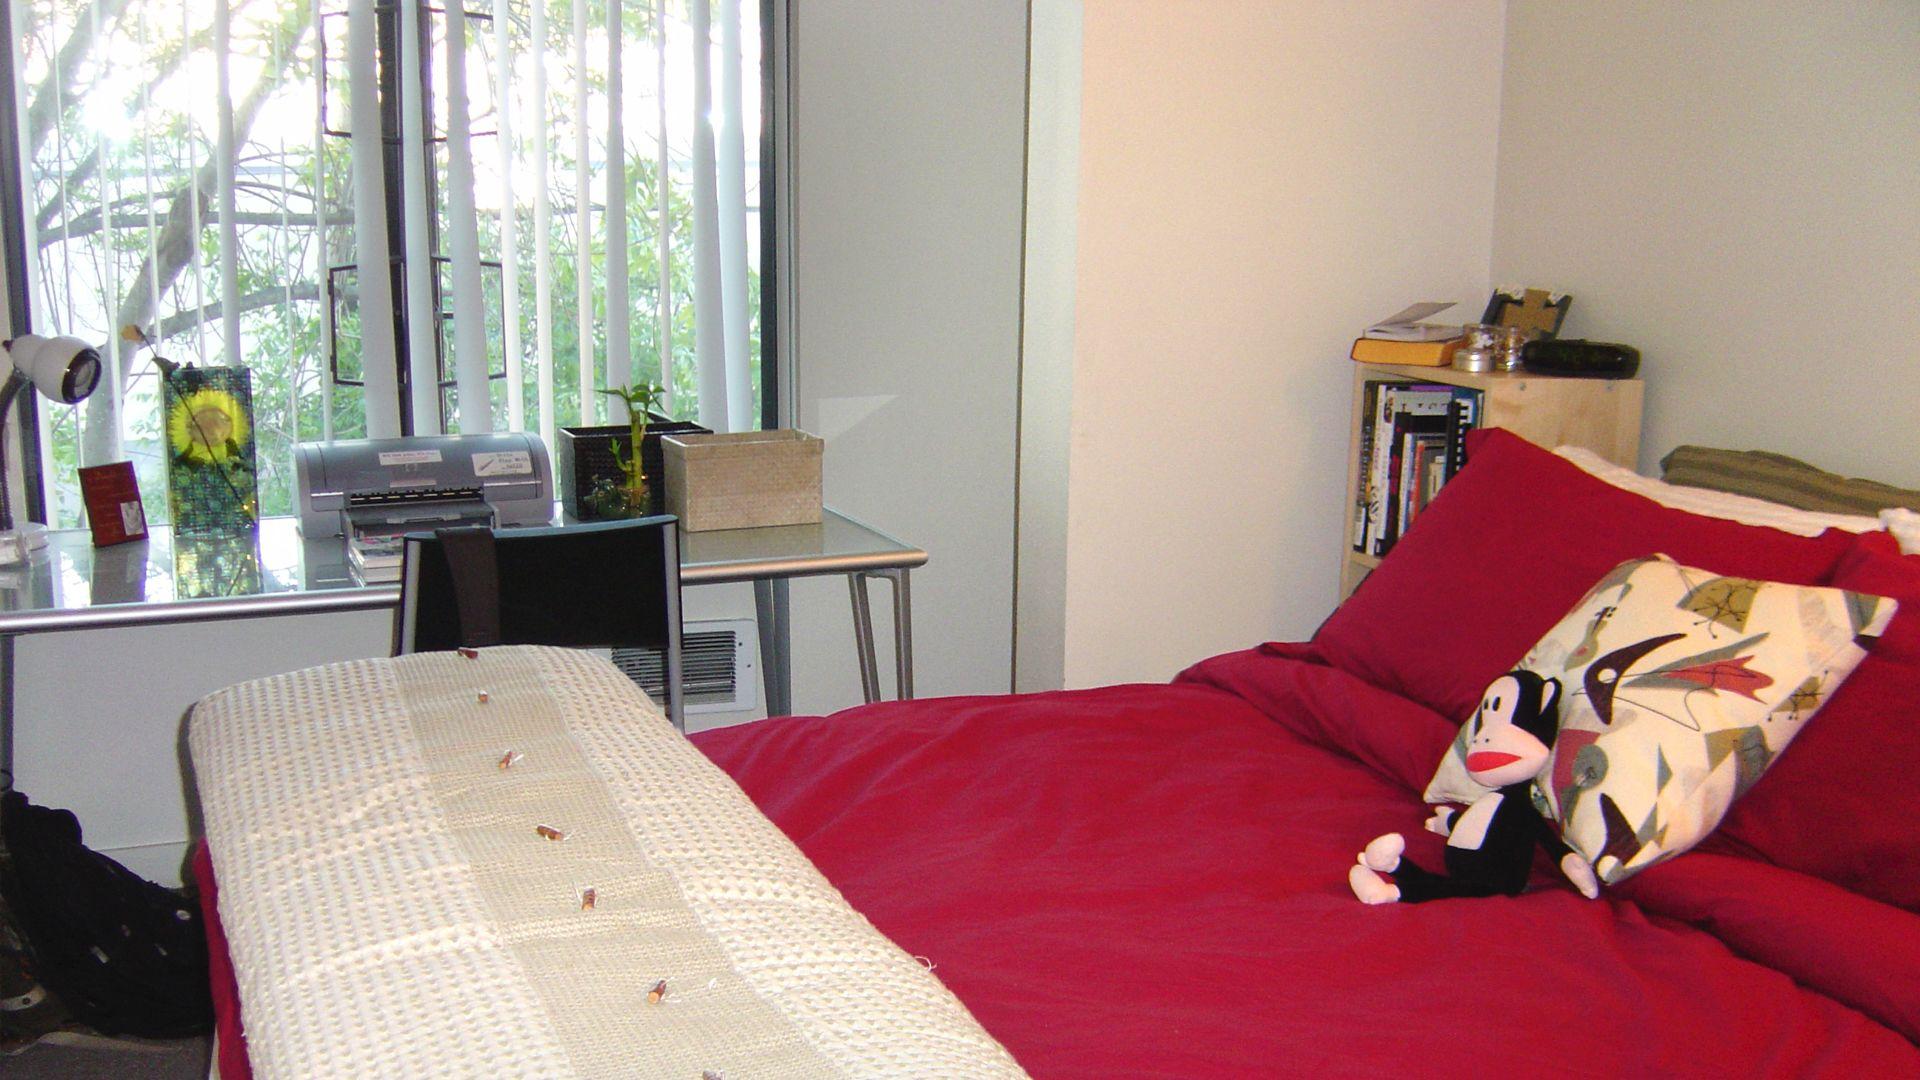 Acton Courtyard Apartments - Bedroom